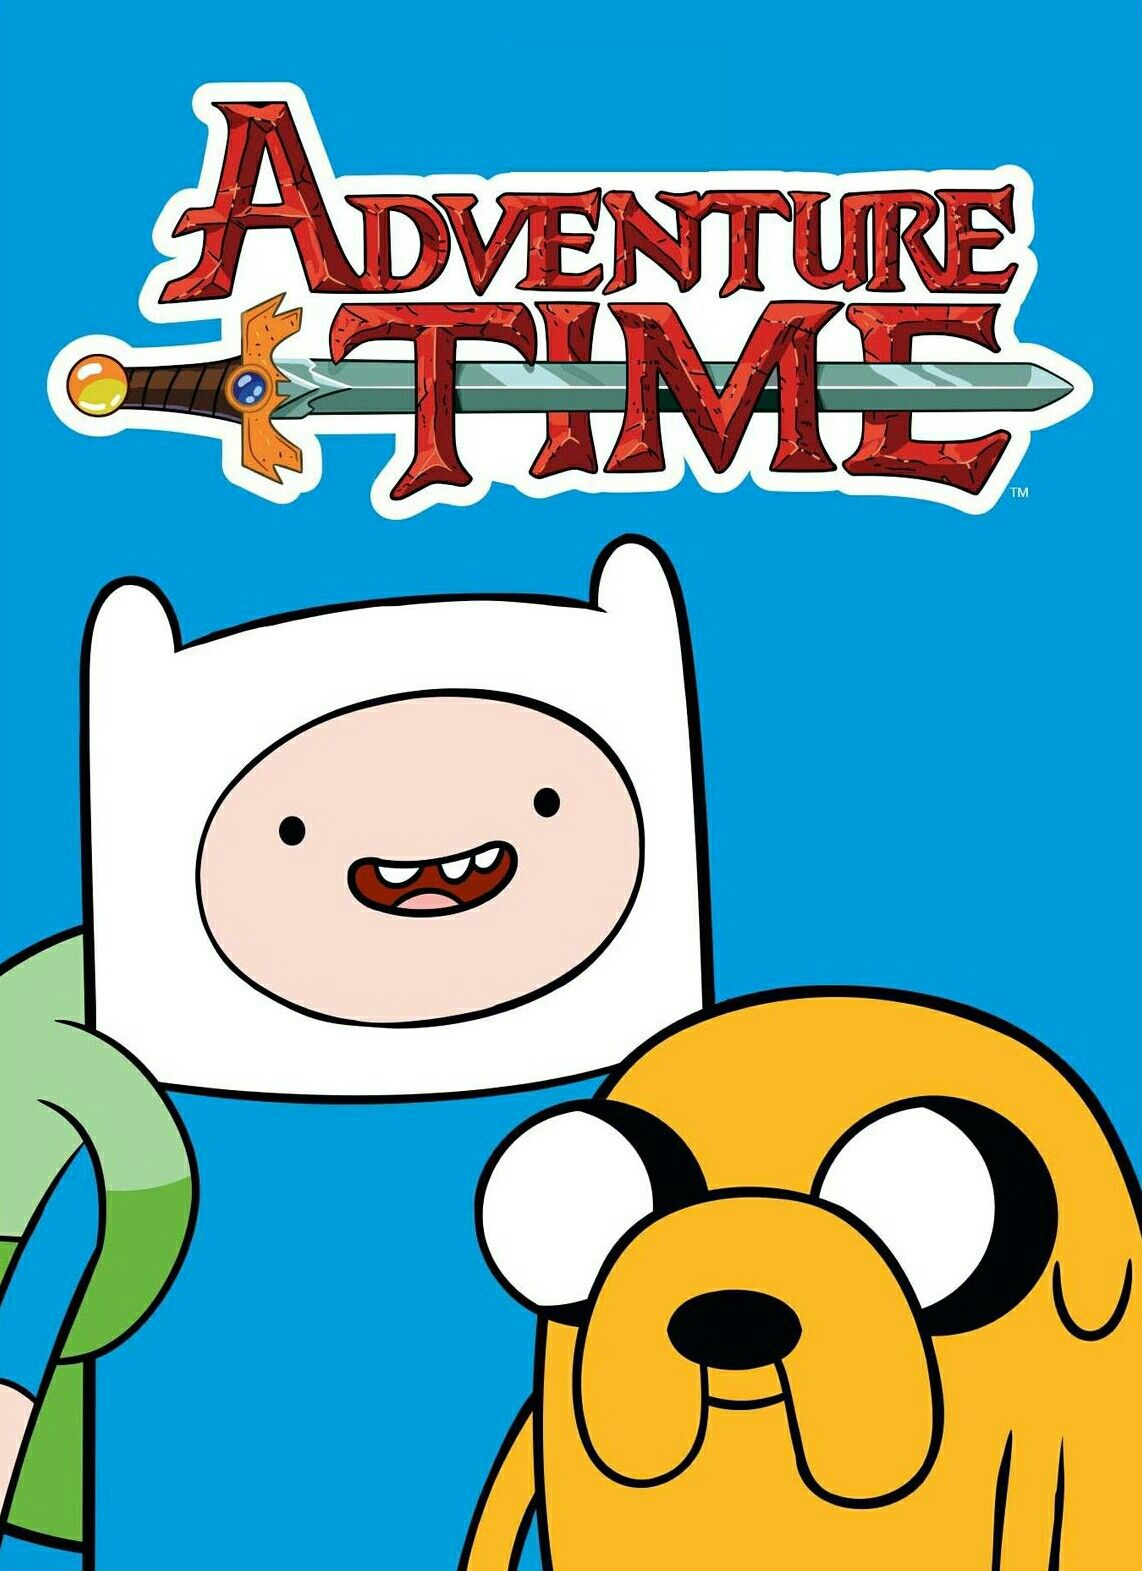 Adventure Time ( Giờ Phiêu Lưu ) 🎂 2010 Adventure time